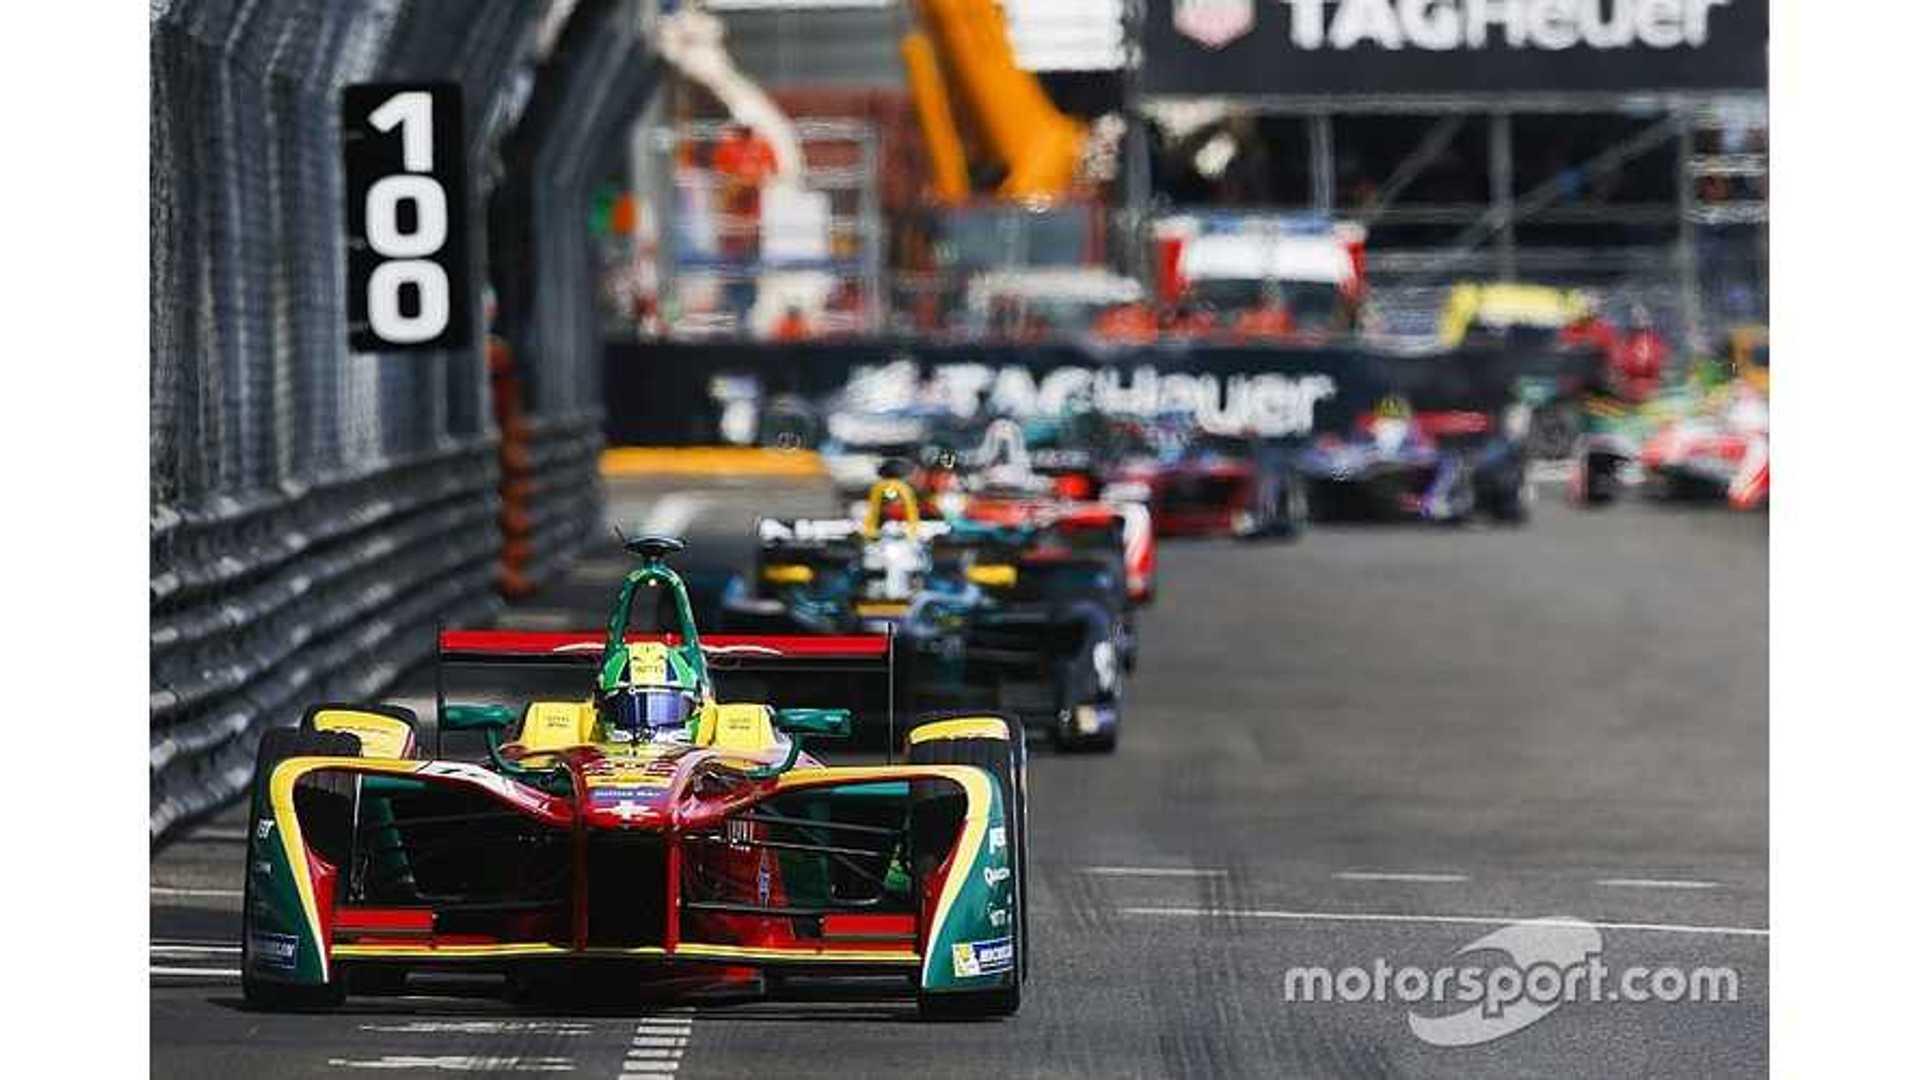 Formula E U0026 39 S Plans To Use Monaco F1 Layout Set To Fall Through